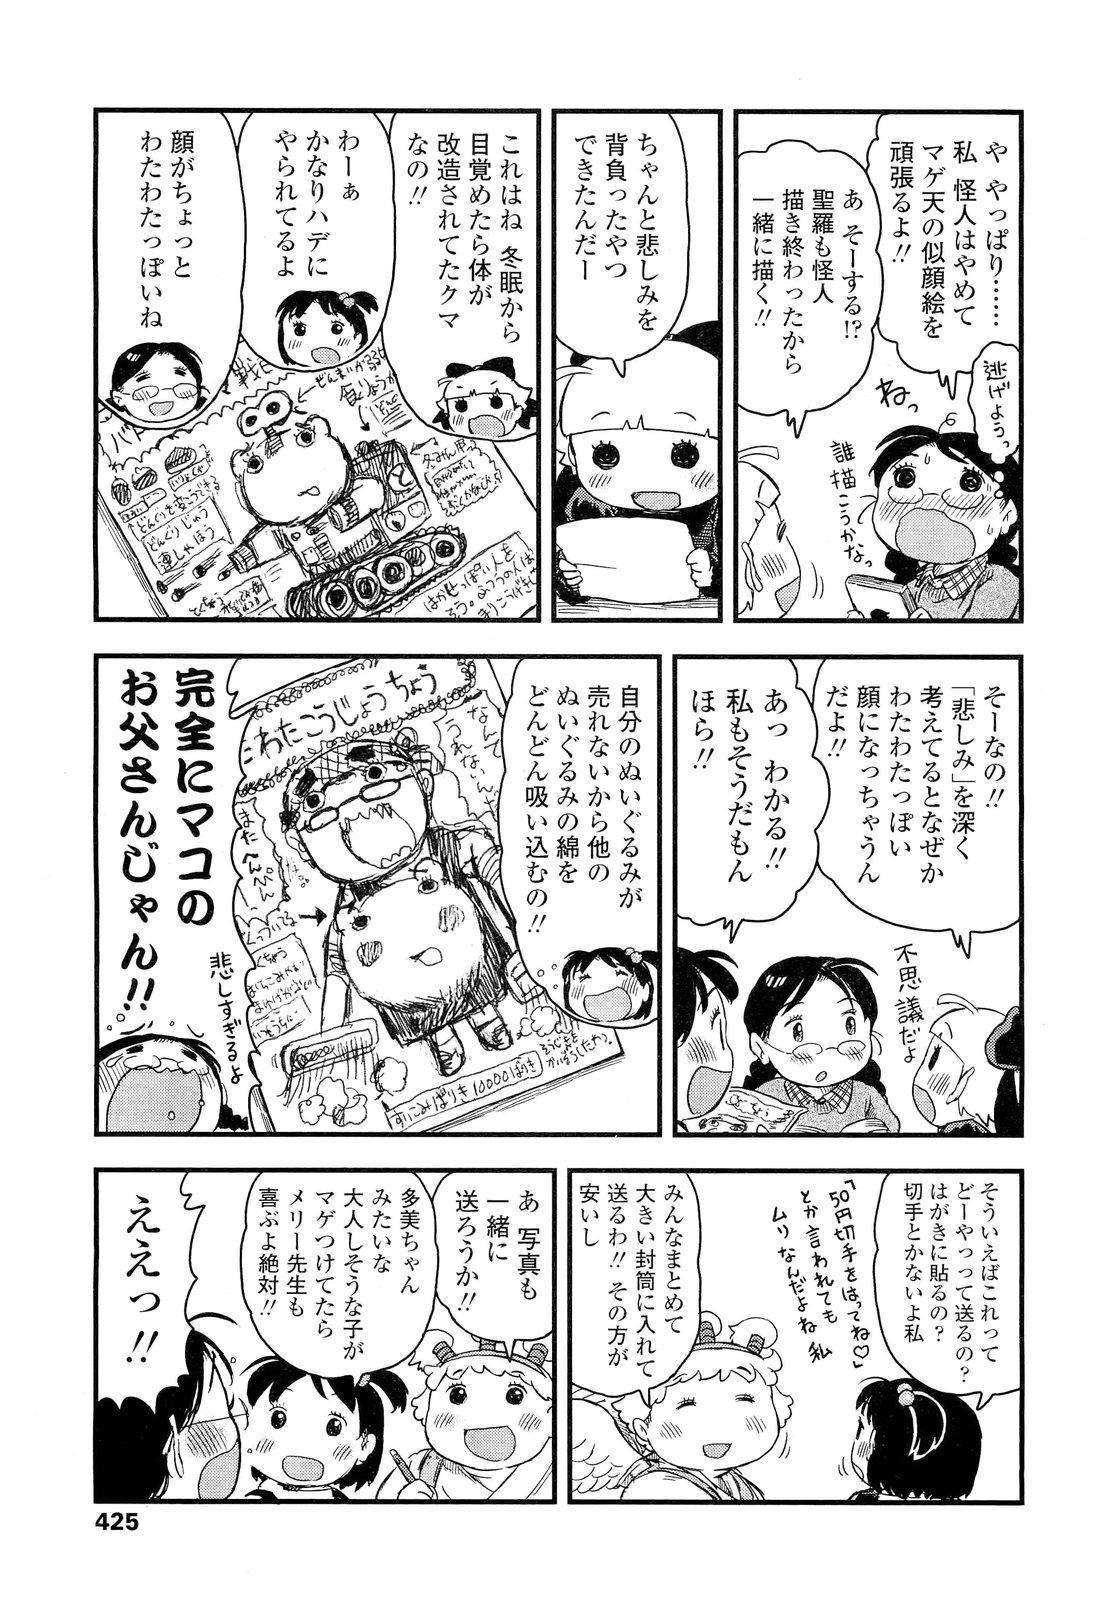 COMIC LO 2012-05 Vol. 98 424